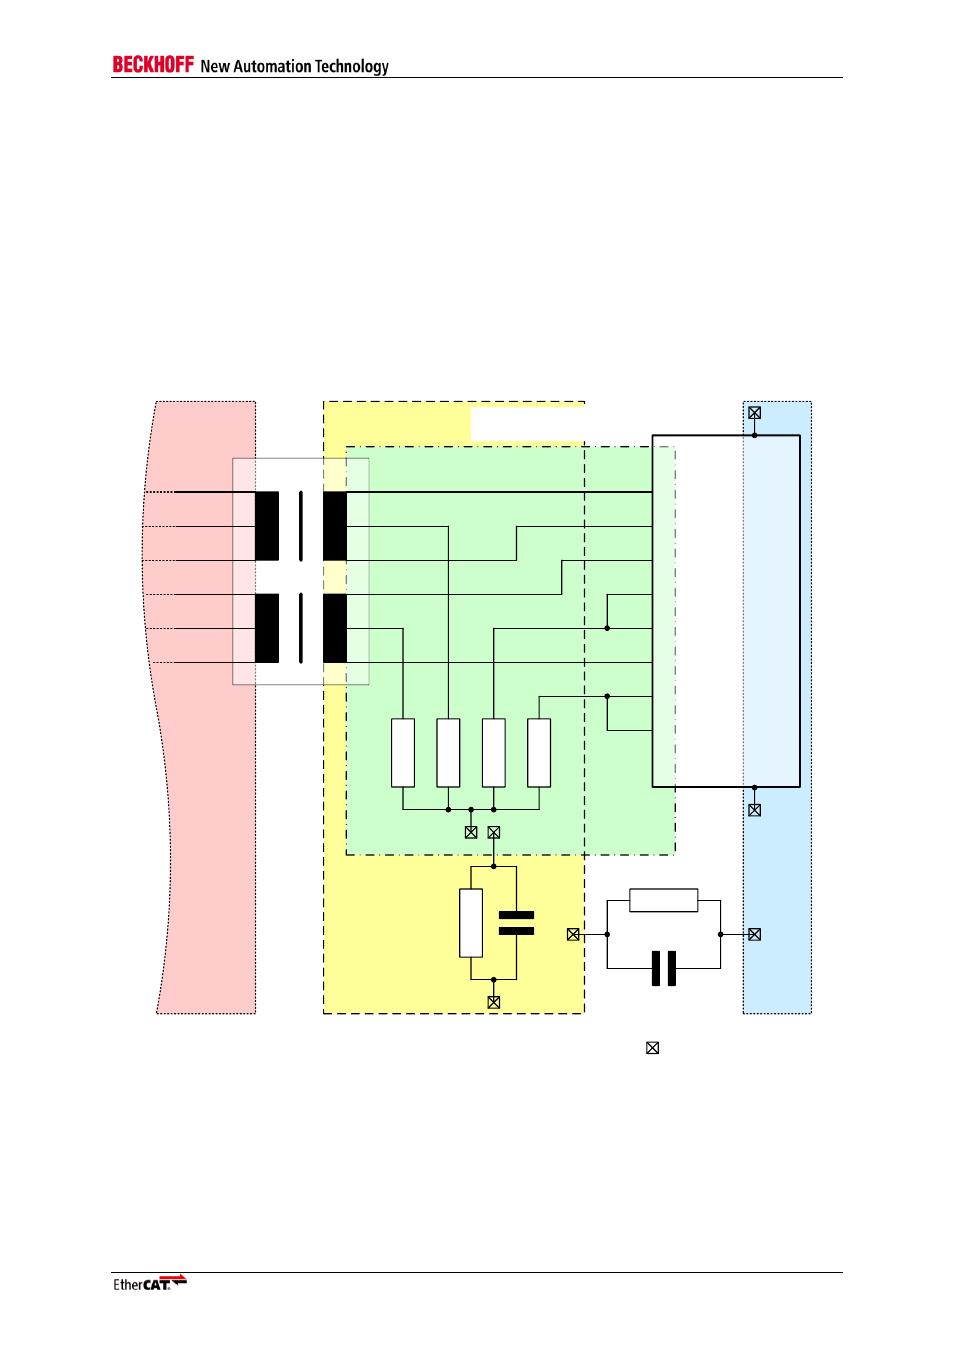 PLCs & HMIs Beckhoff BK1120 EtherCat PLC KL1418 KL2408 KL2541 ...